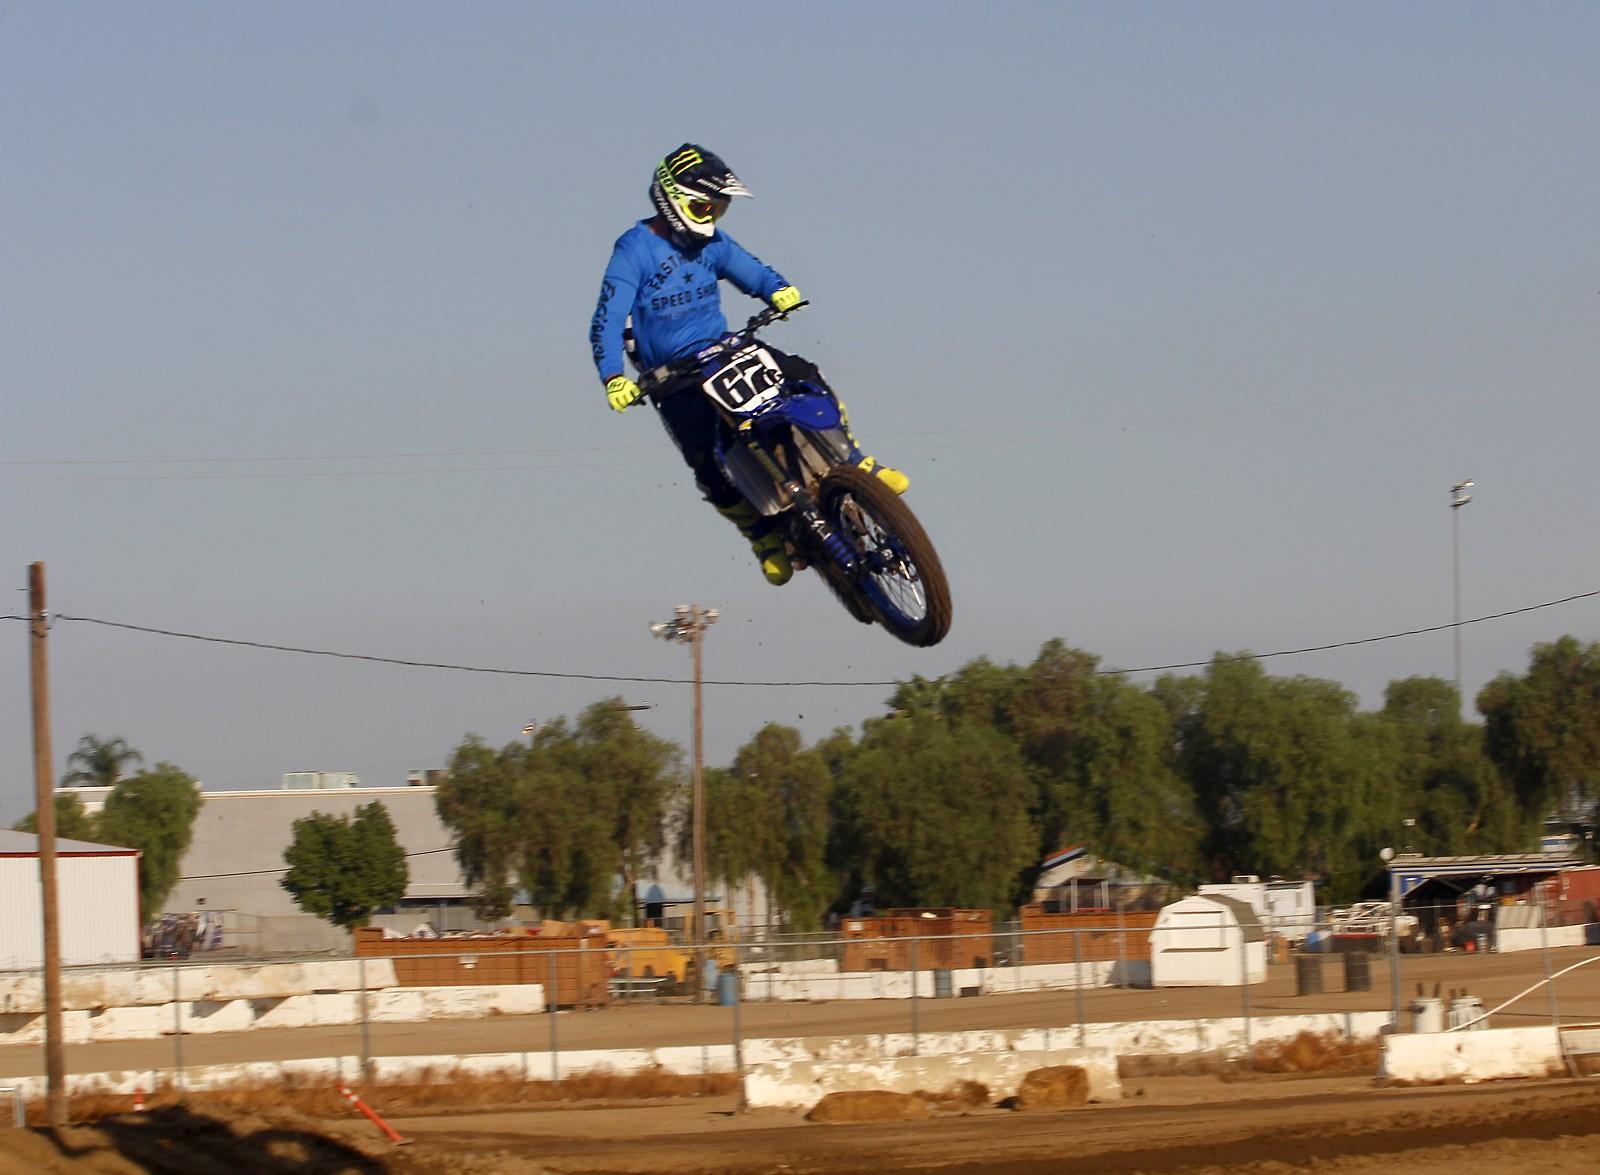 MG 5143 - moto67e - Motocross Pictures - Vital MX